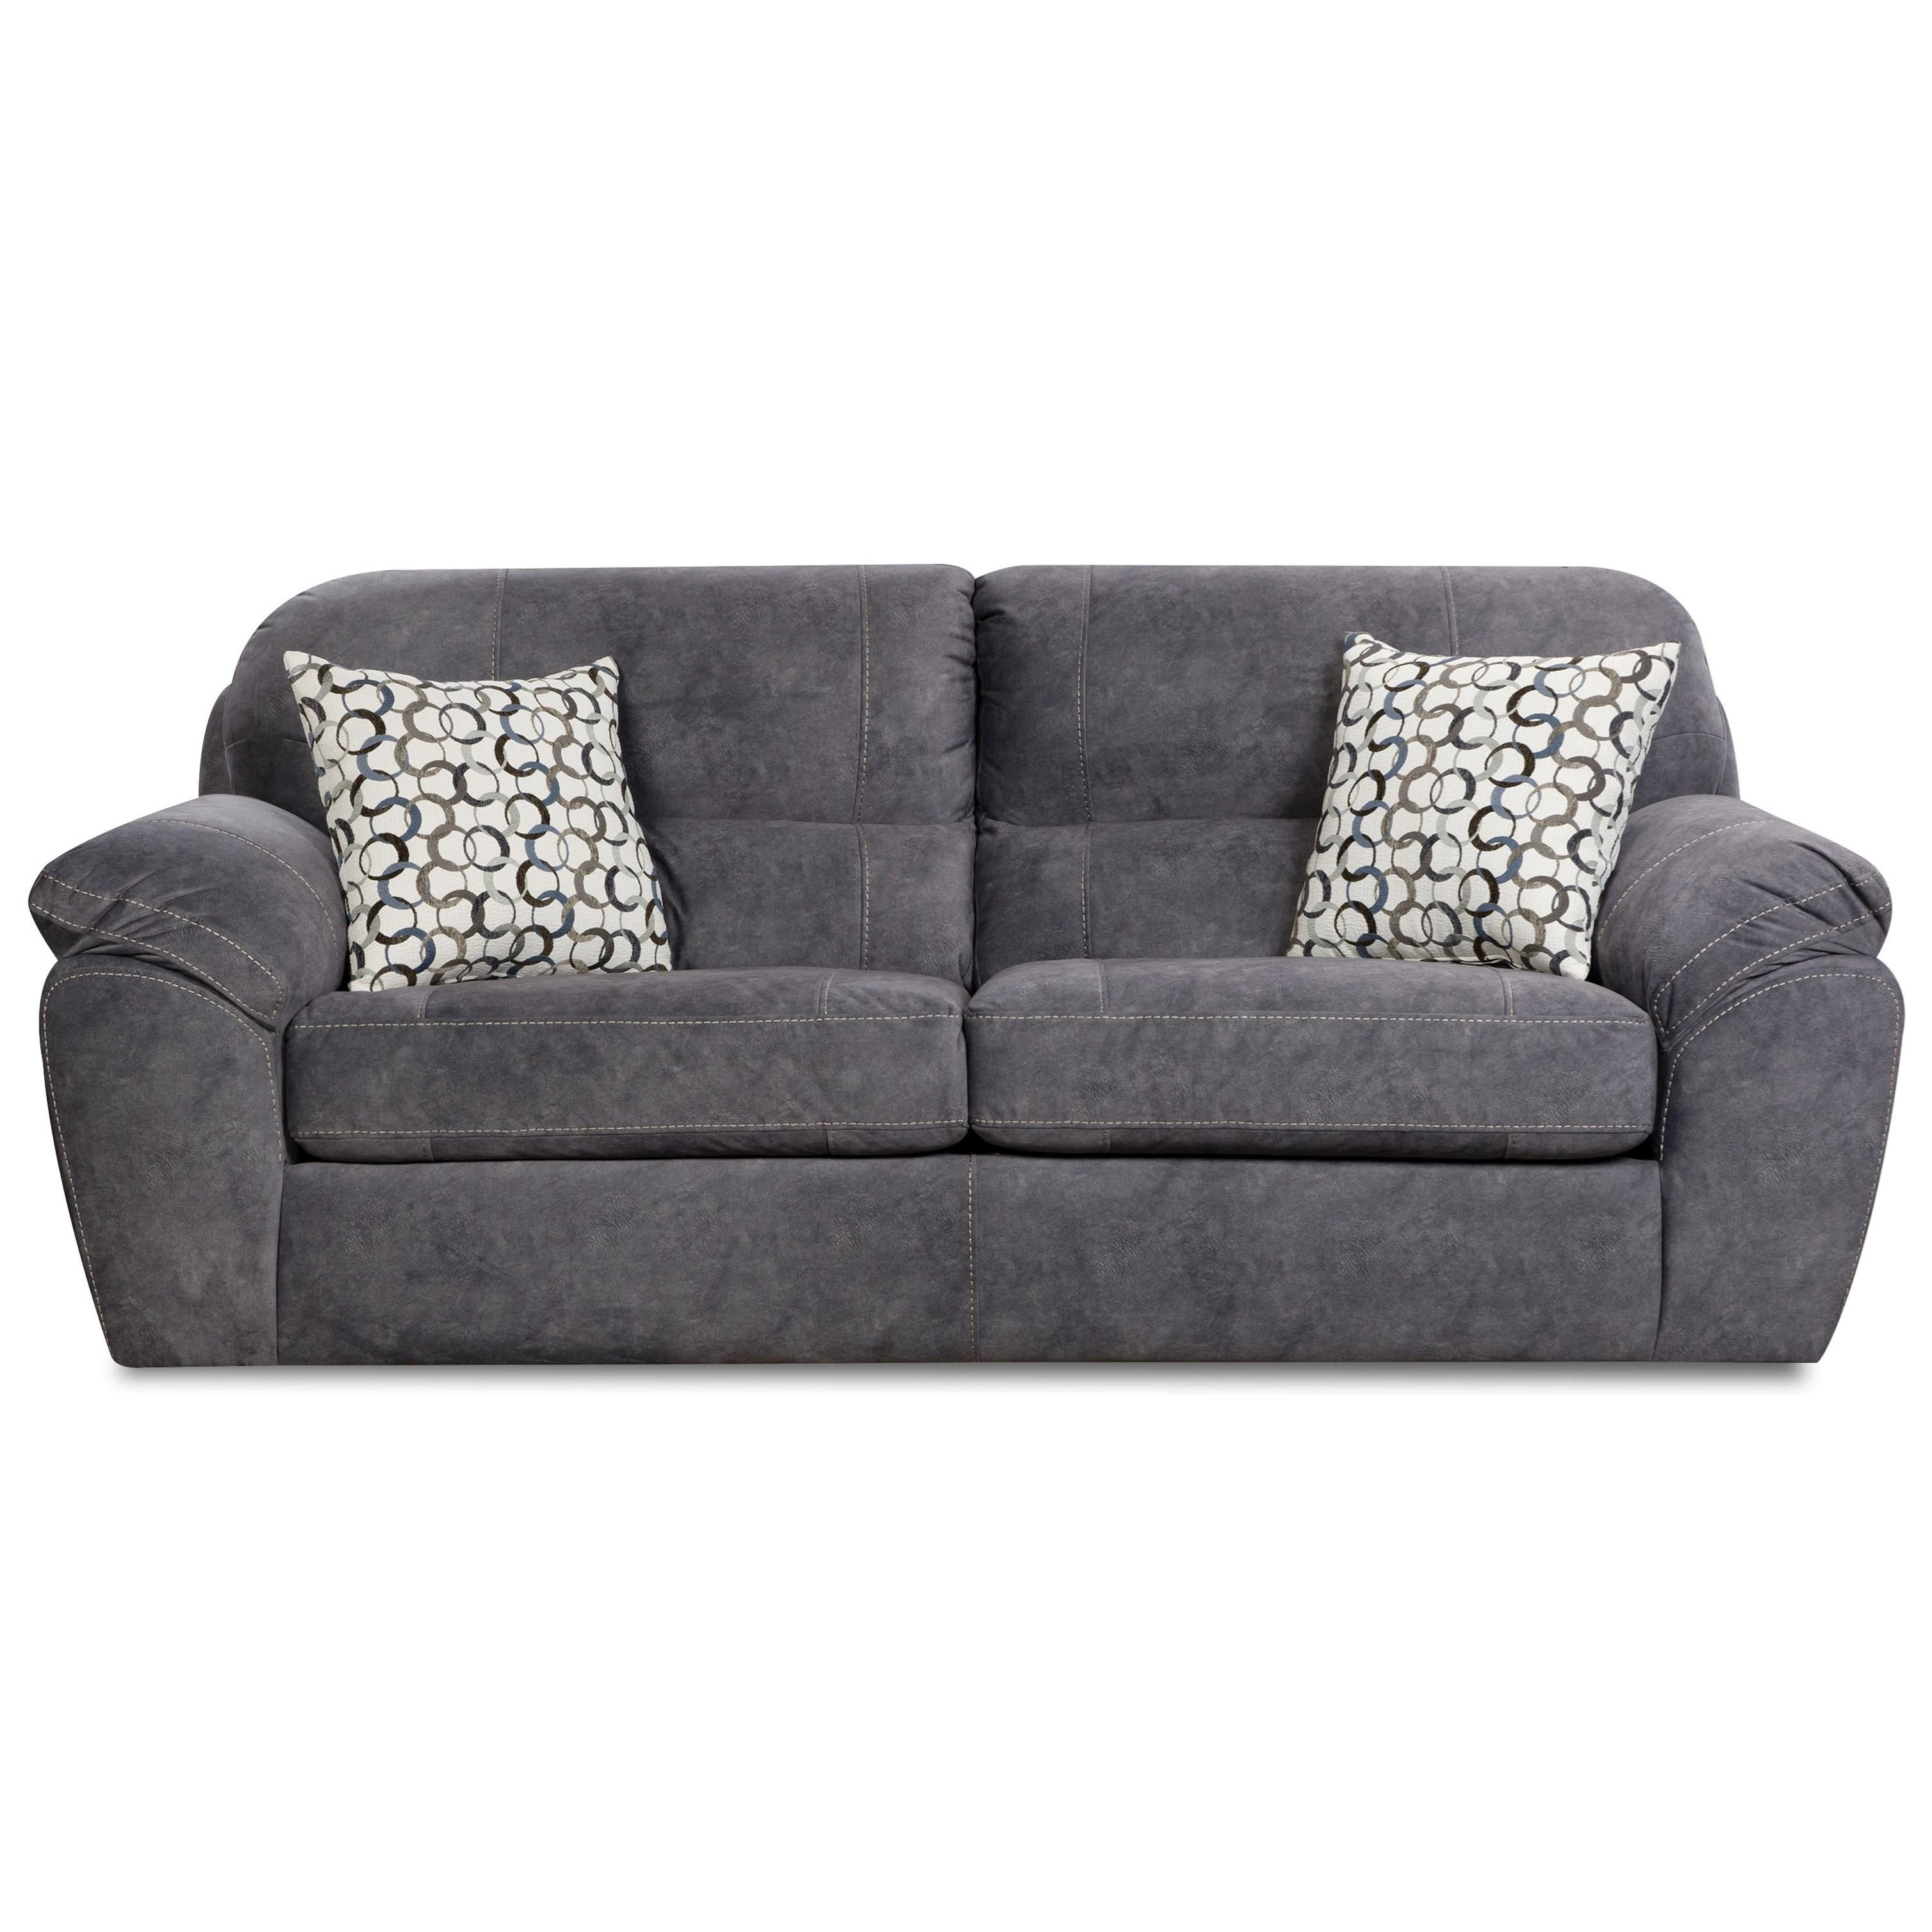 18C0 Sofa by Corinthian at Story & Lee Furniture